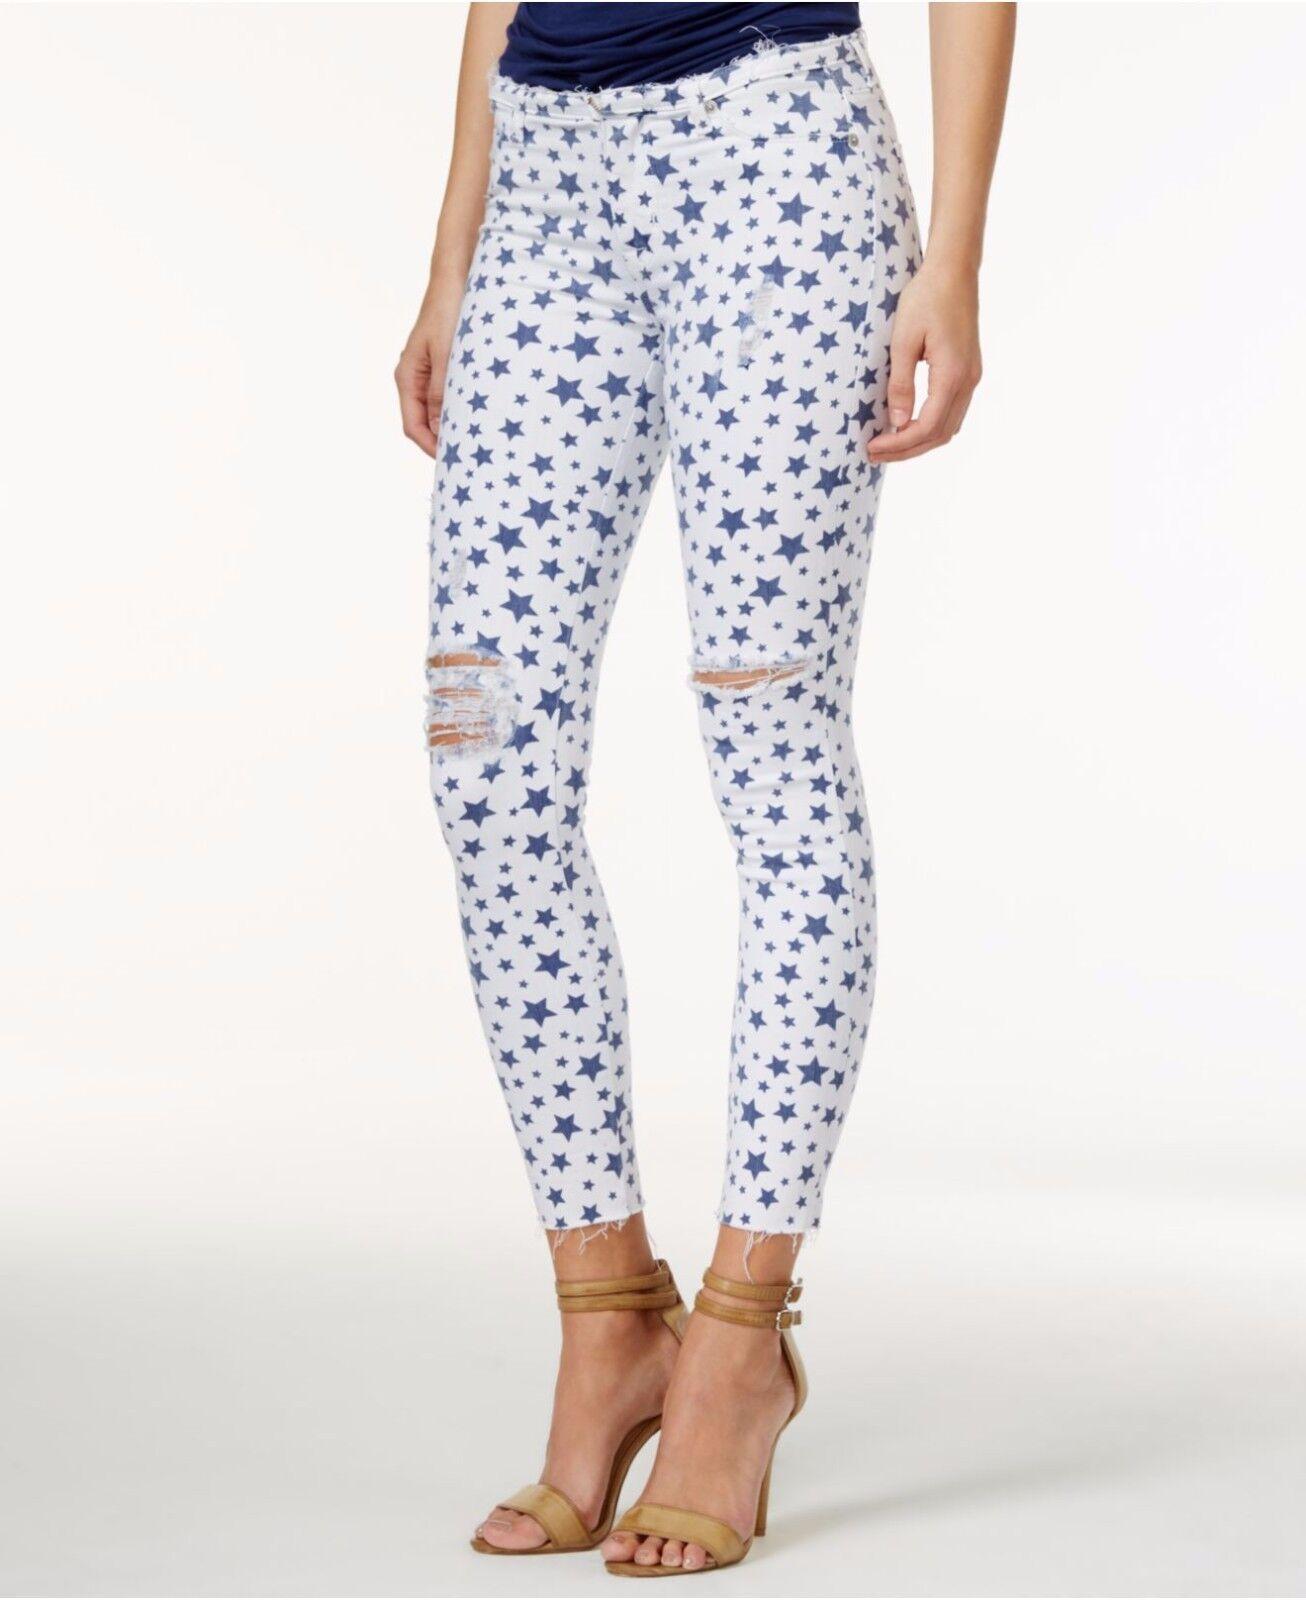 Hudson Jeans Crop Krista Glimmer Star-Print Super Skinny Ankle Jeans Size 28